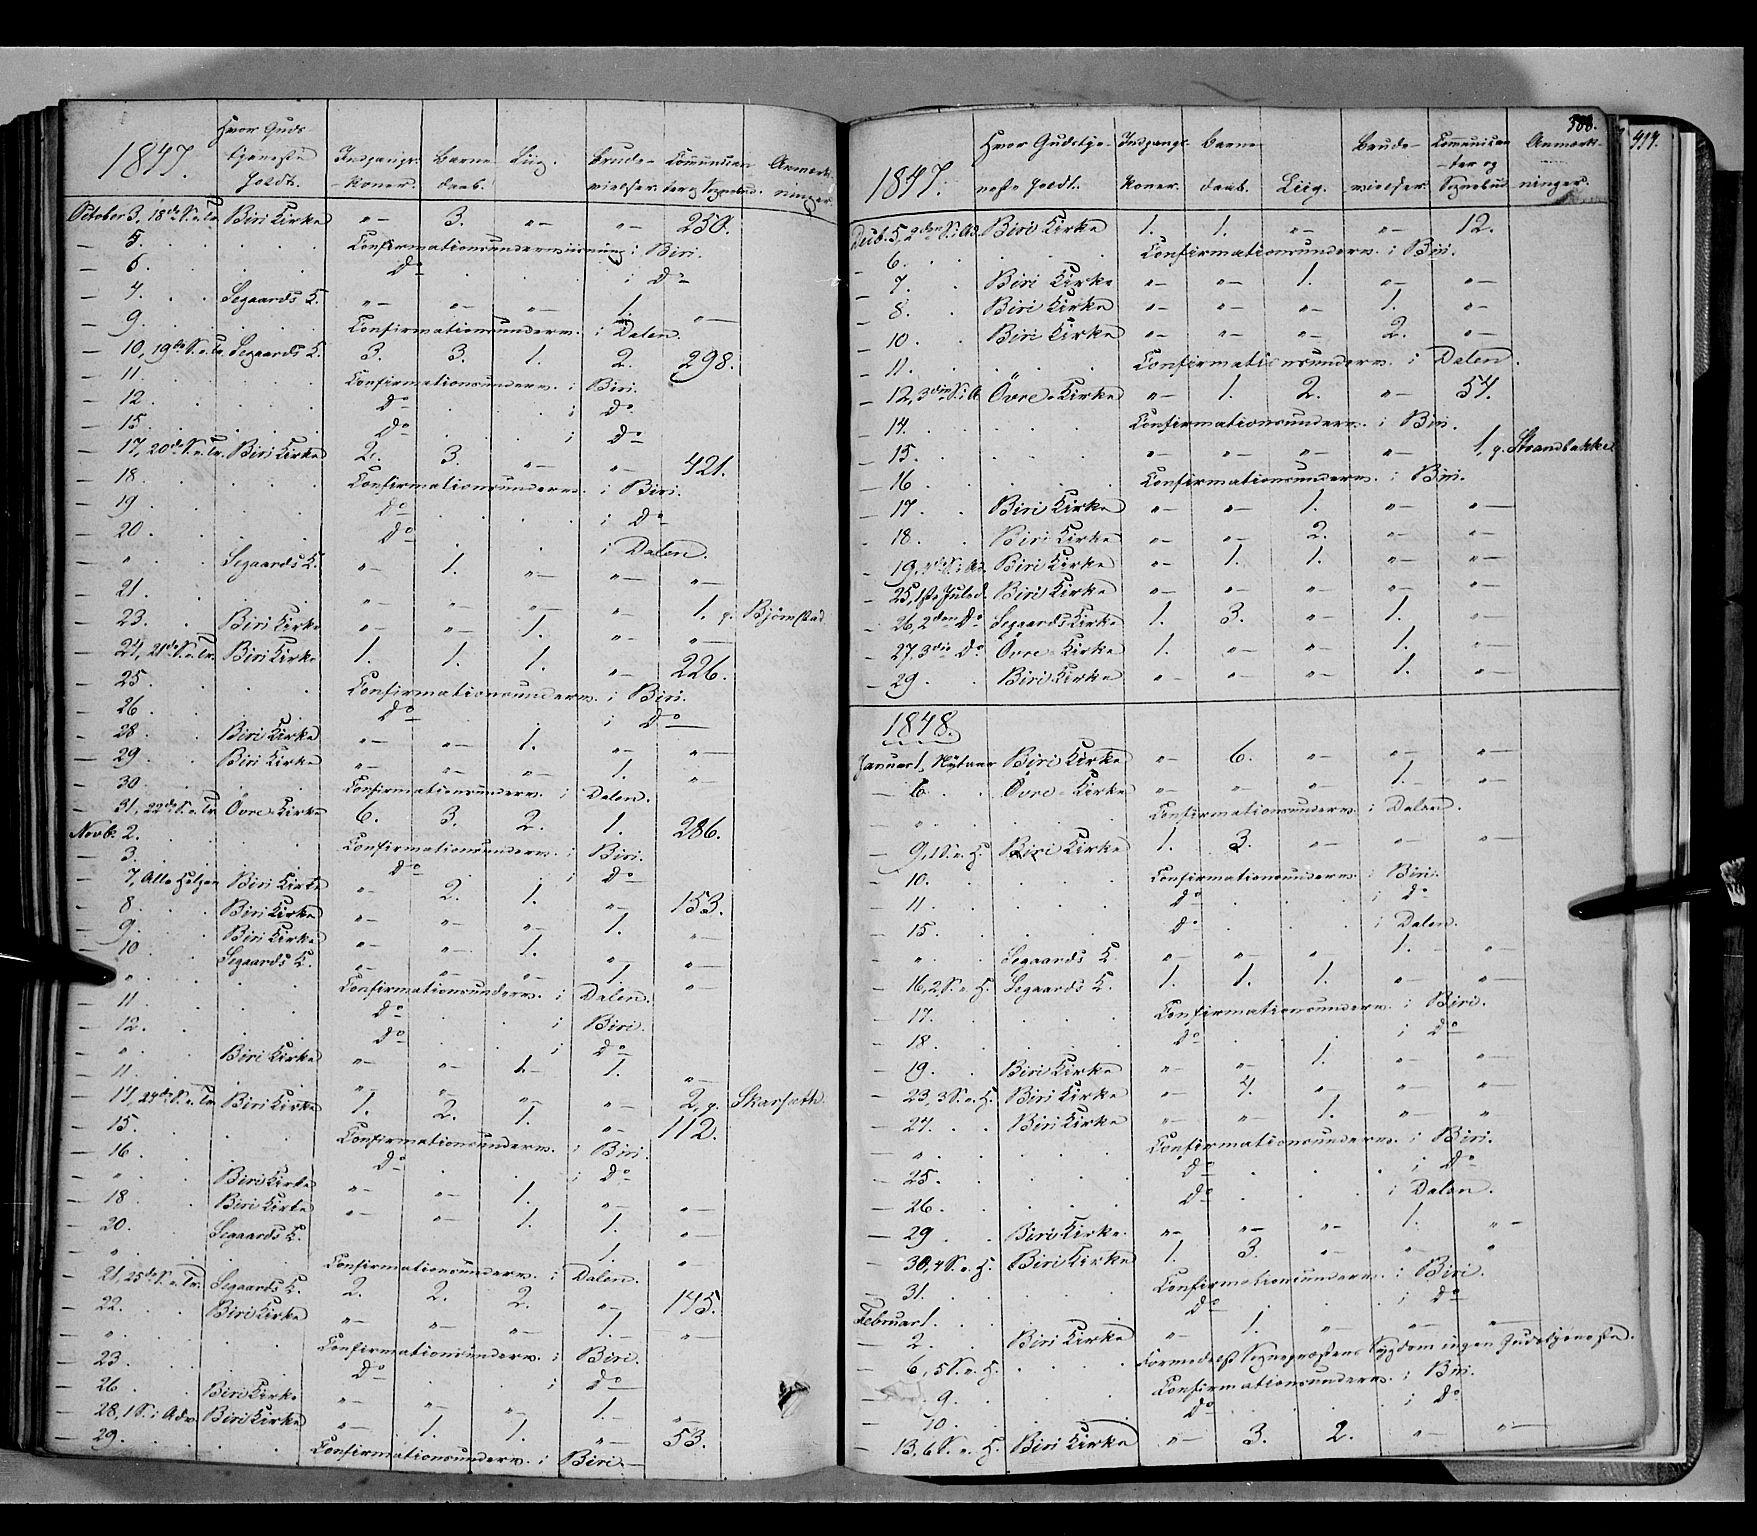 SAH, Biri prestekontor, Ministerialbok nr. 5, 1843-1854, s. 388